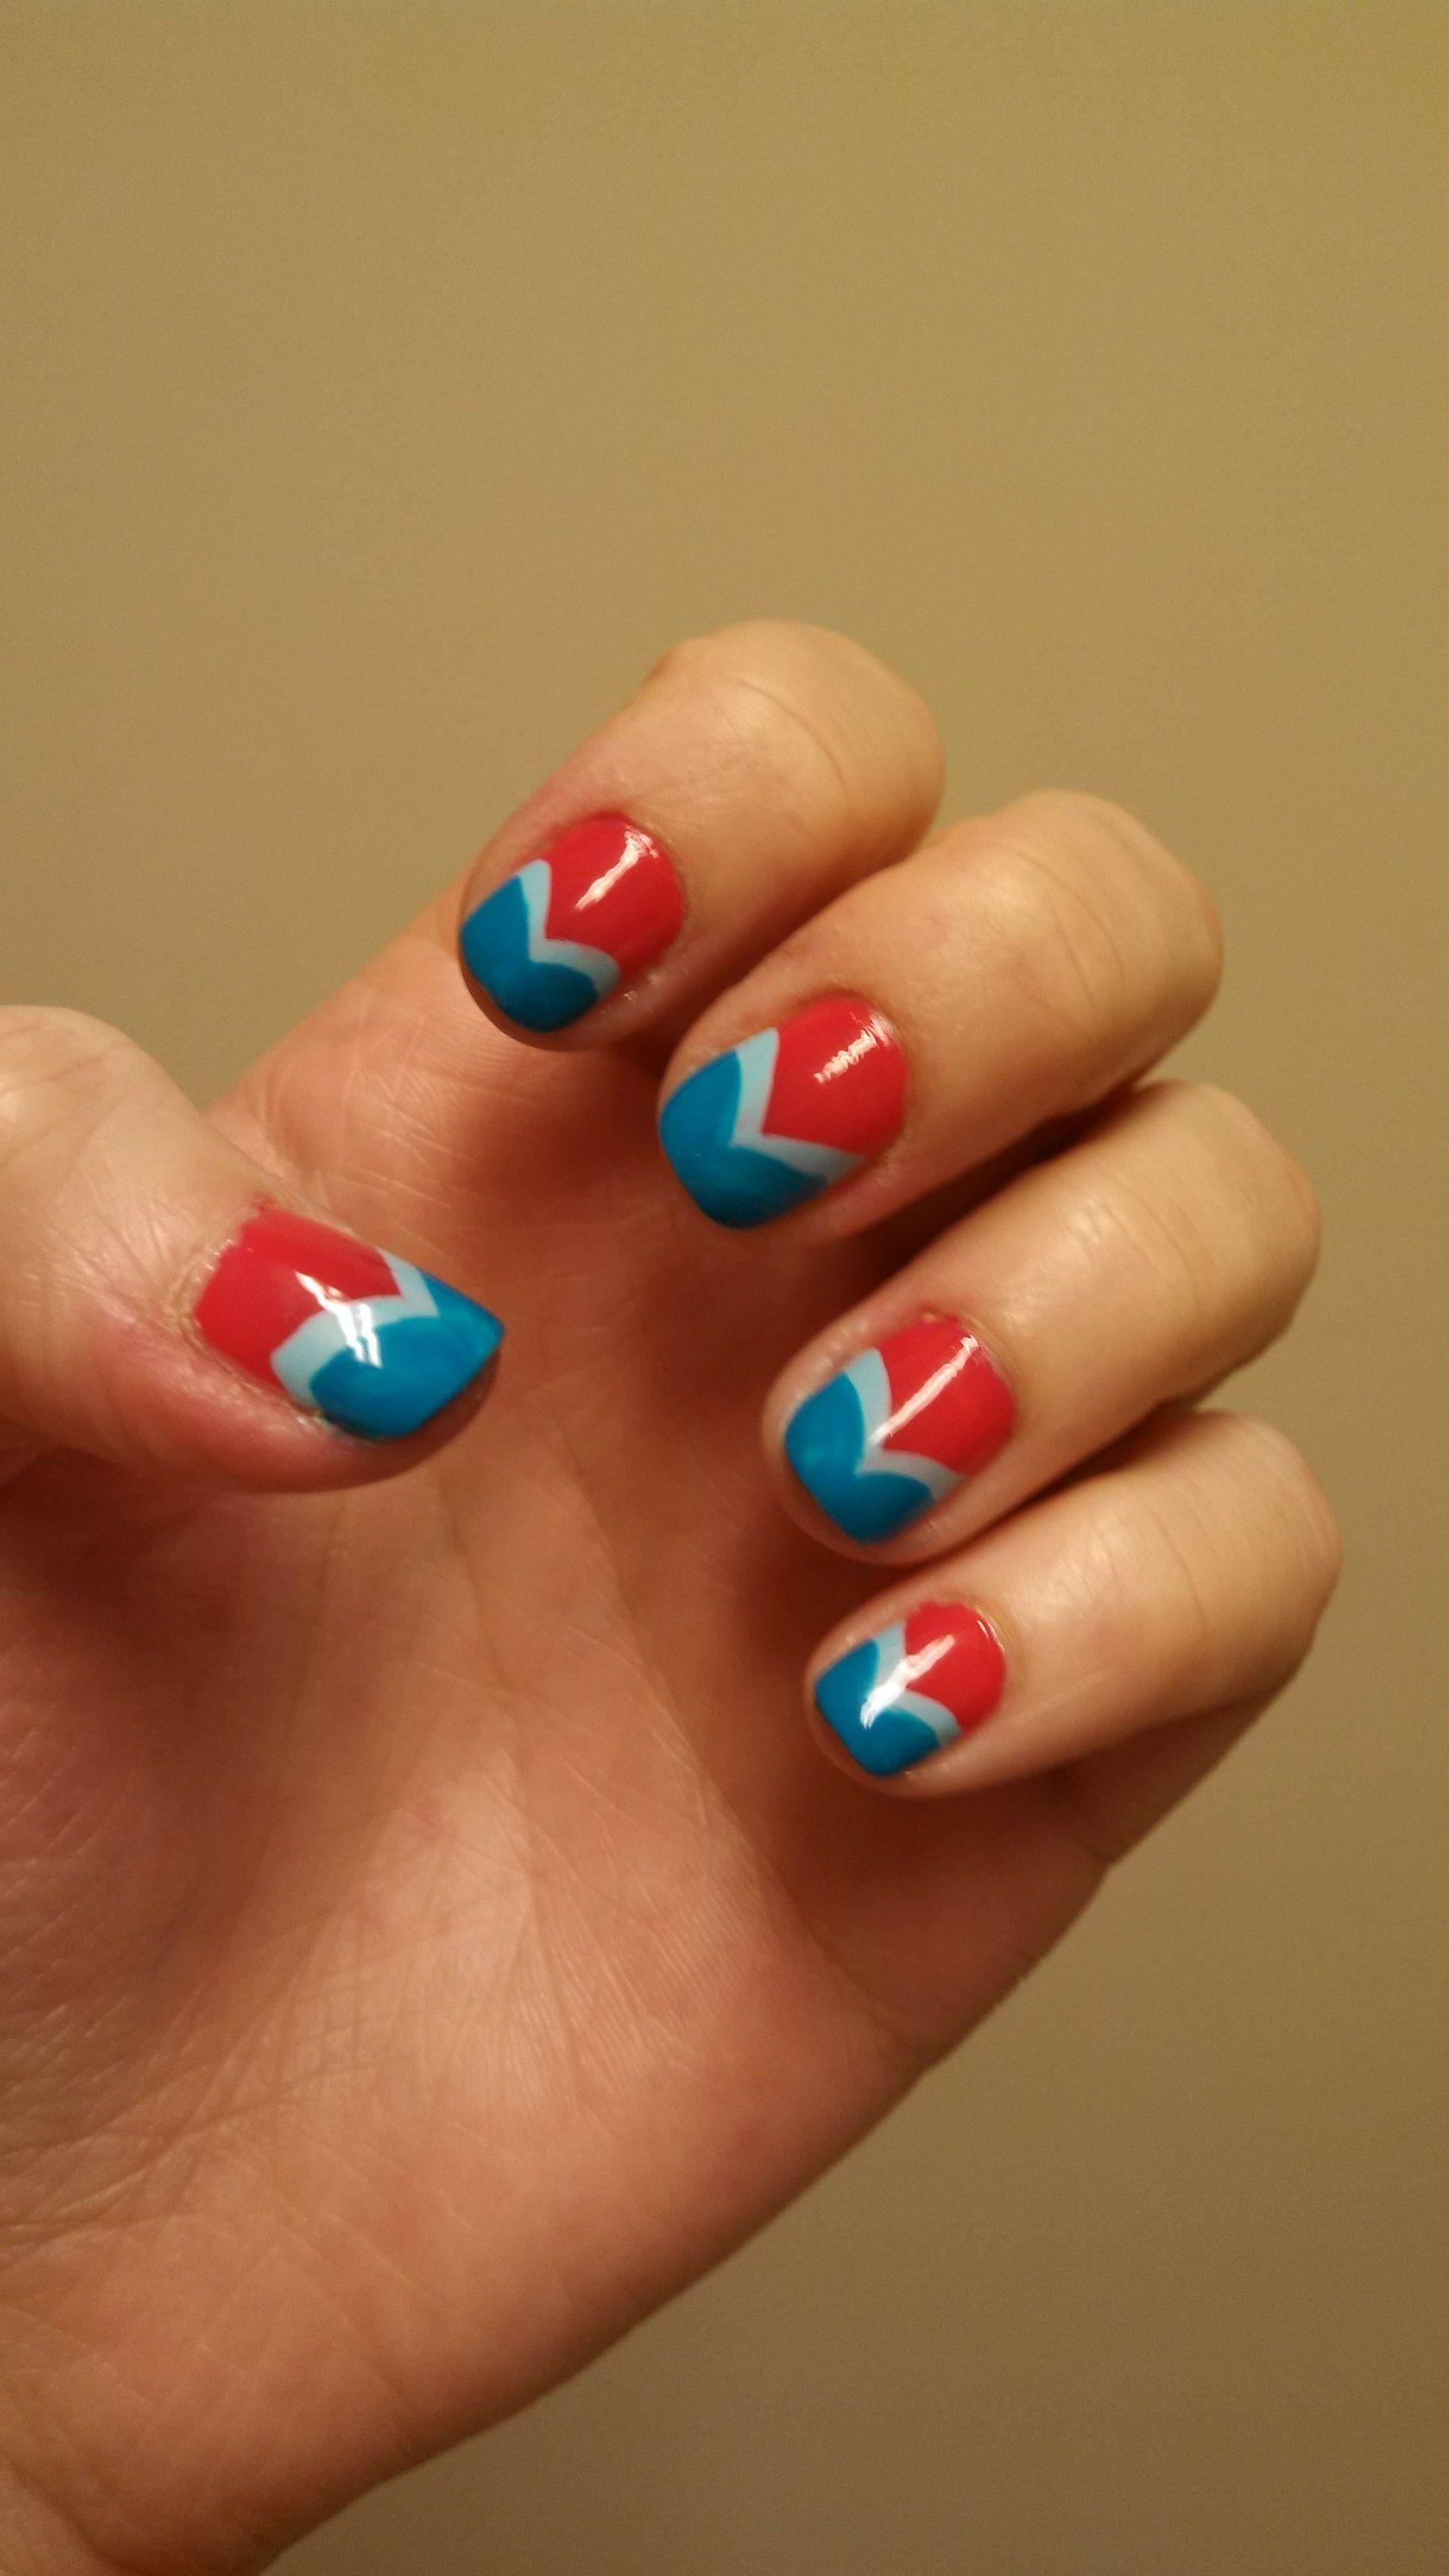 Chalkboard Nails remake Sally Hansen Salon Manicure Frutti Petutie